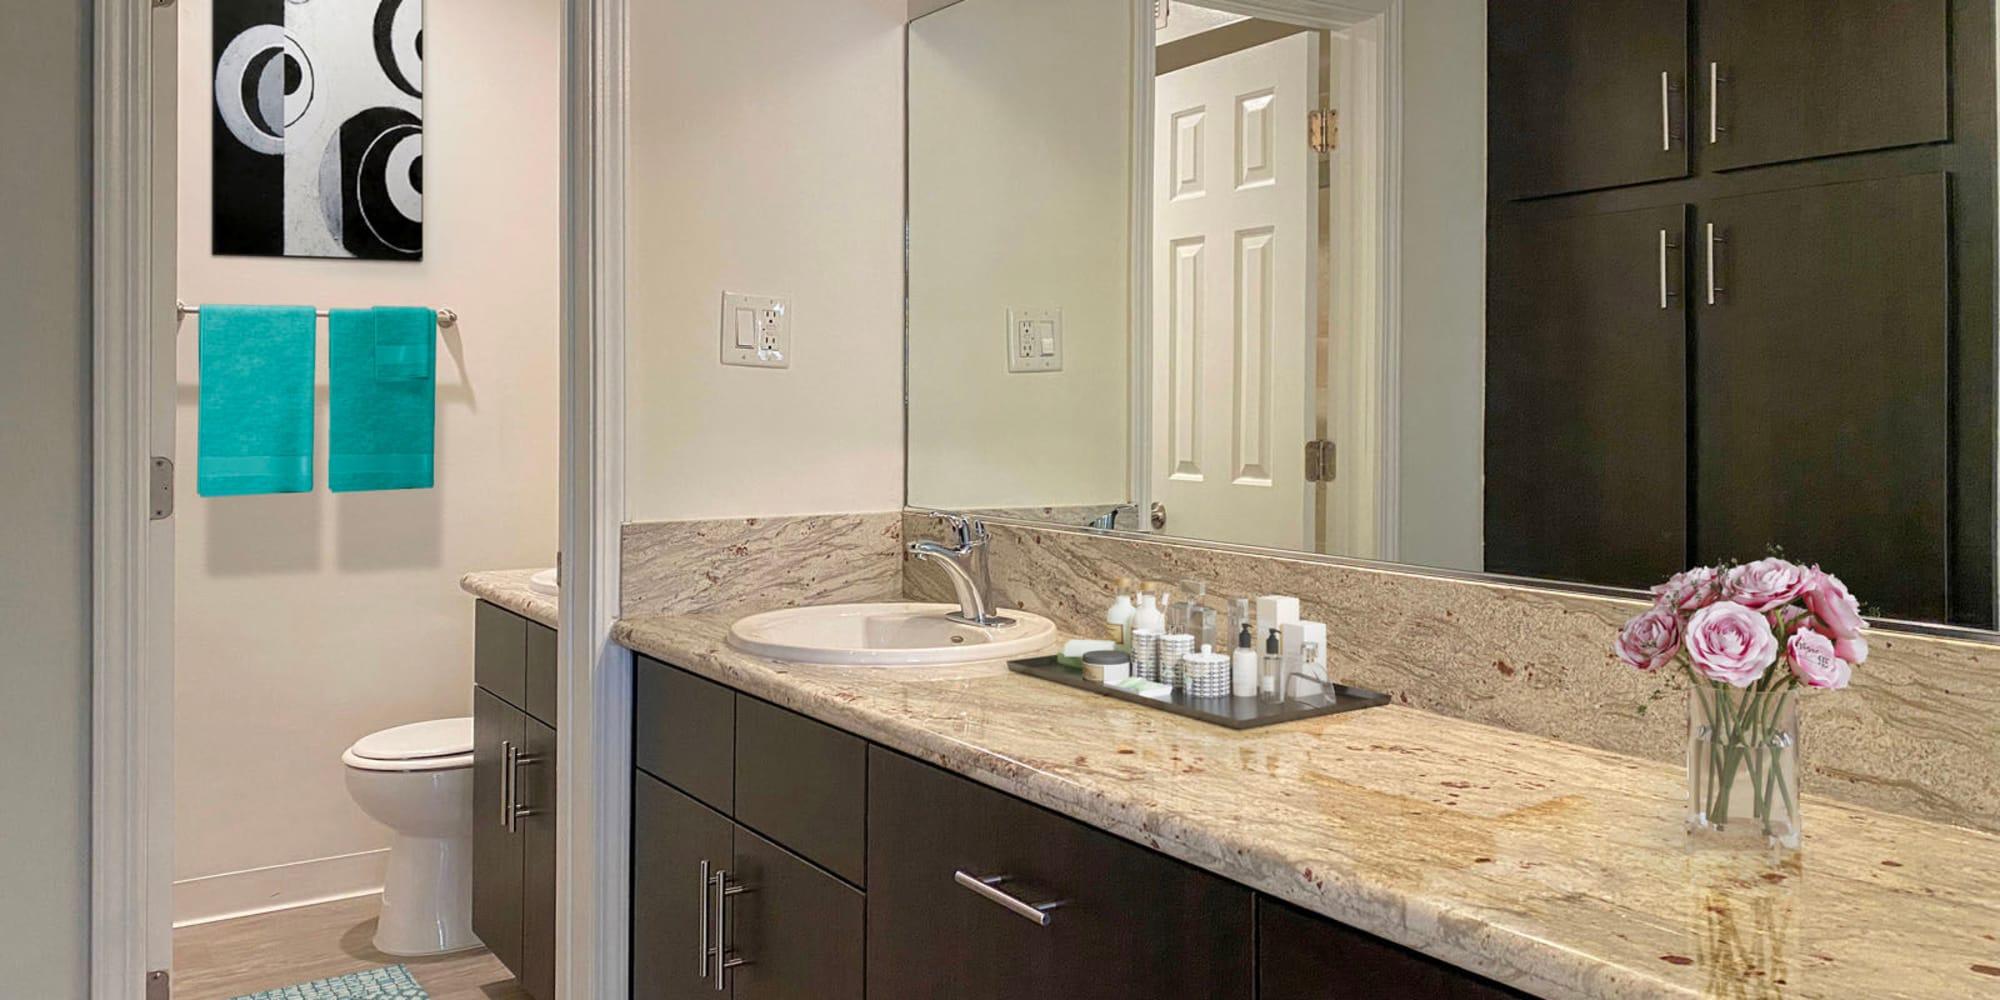 Spacious granite countertop in a model apartment's bathroom at Mediterranean Village in West Hollywood, California